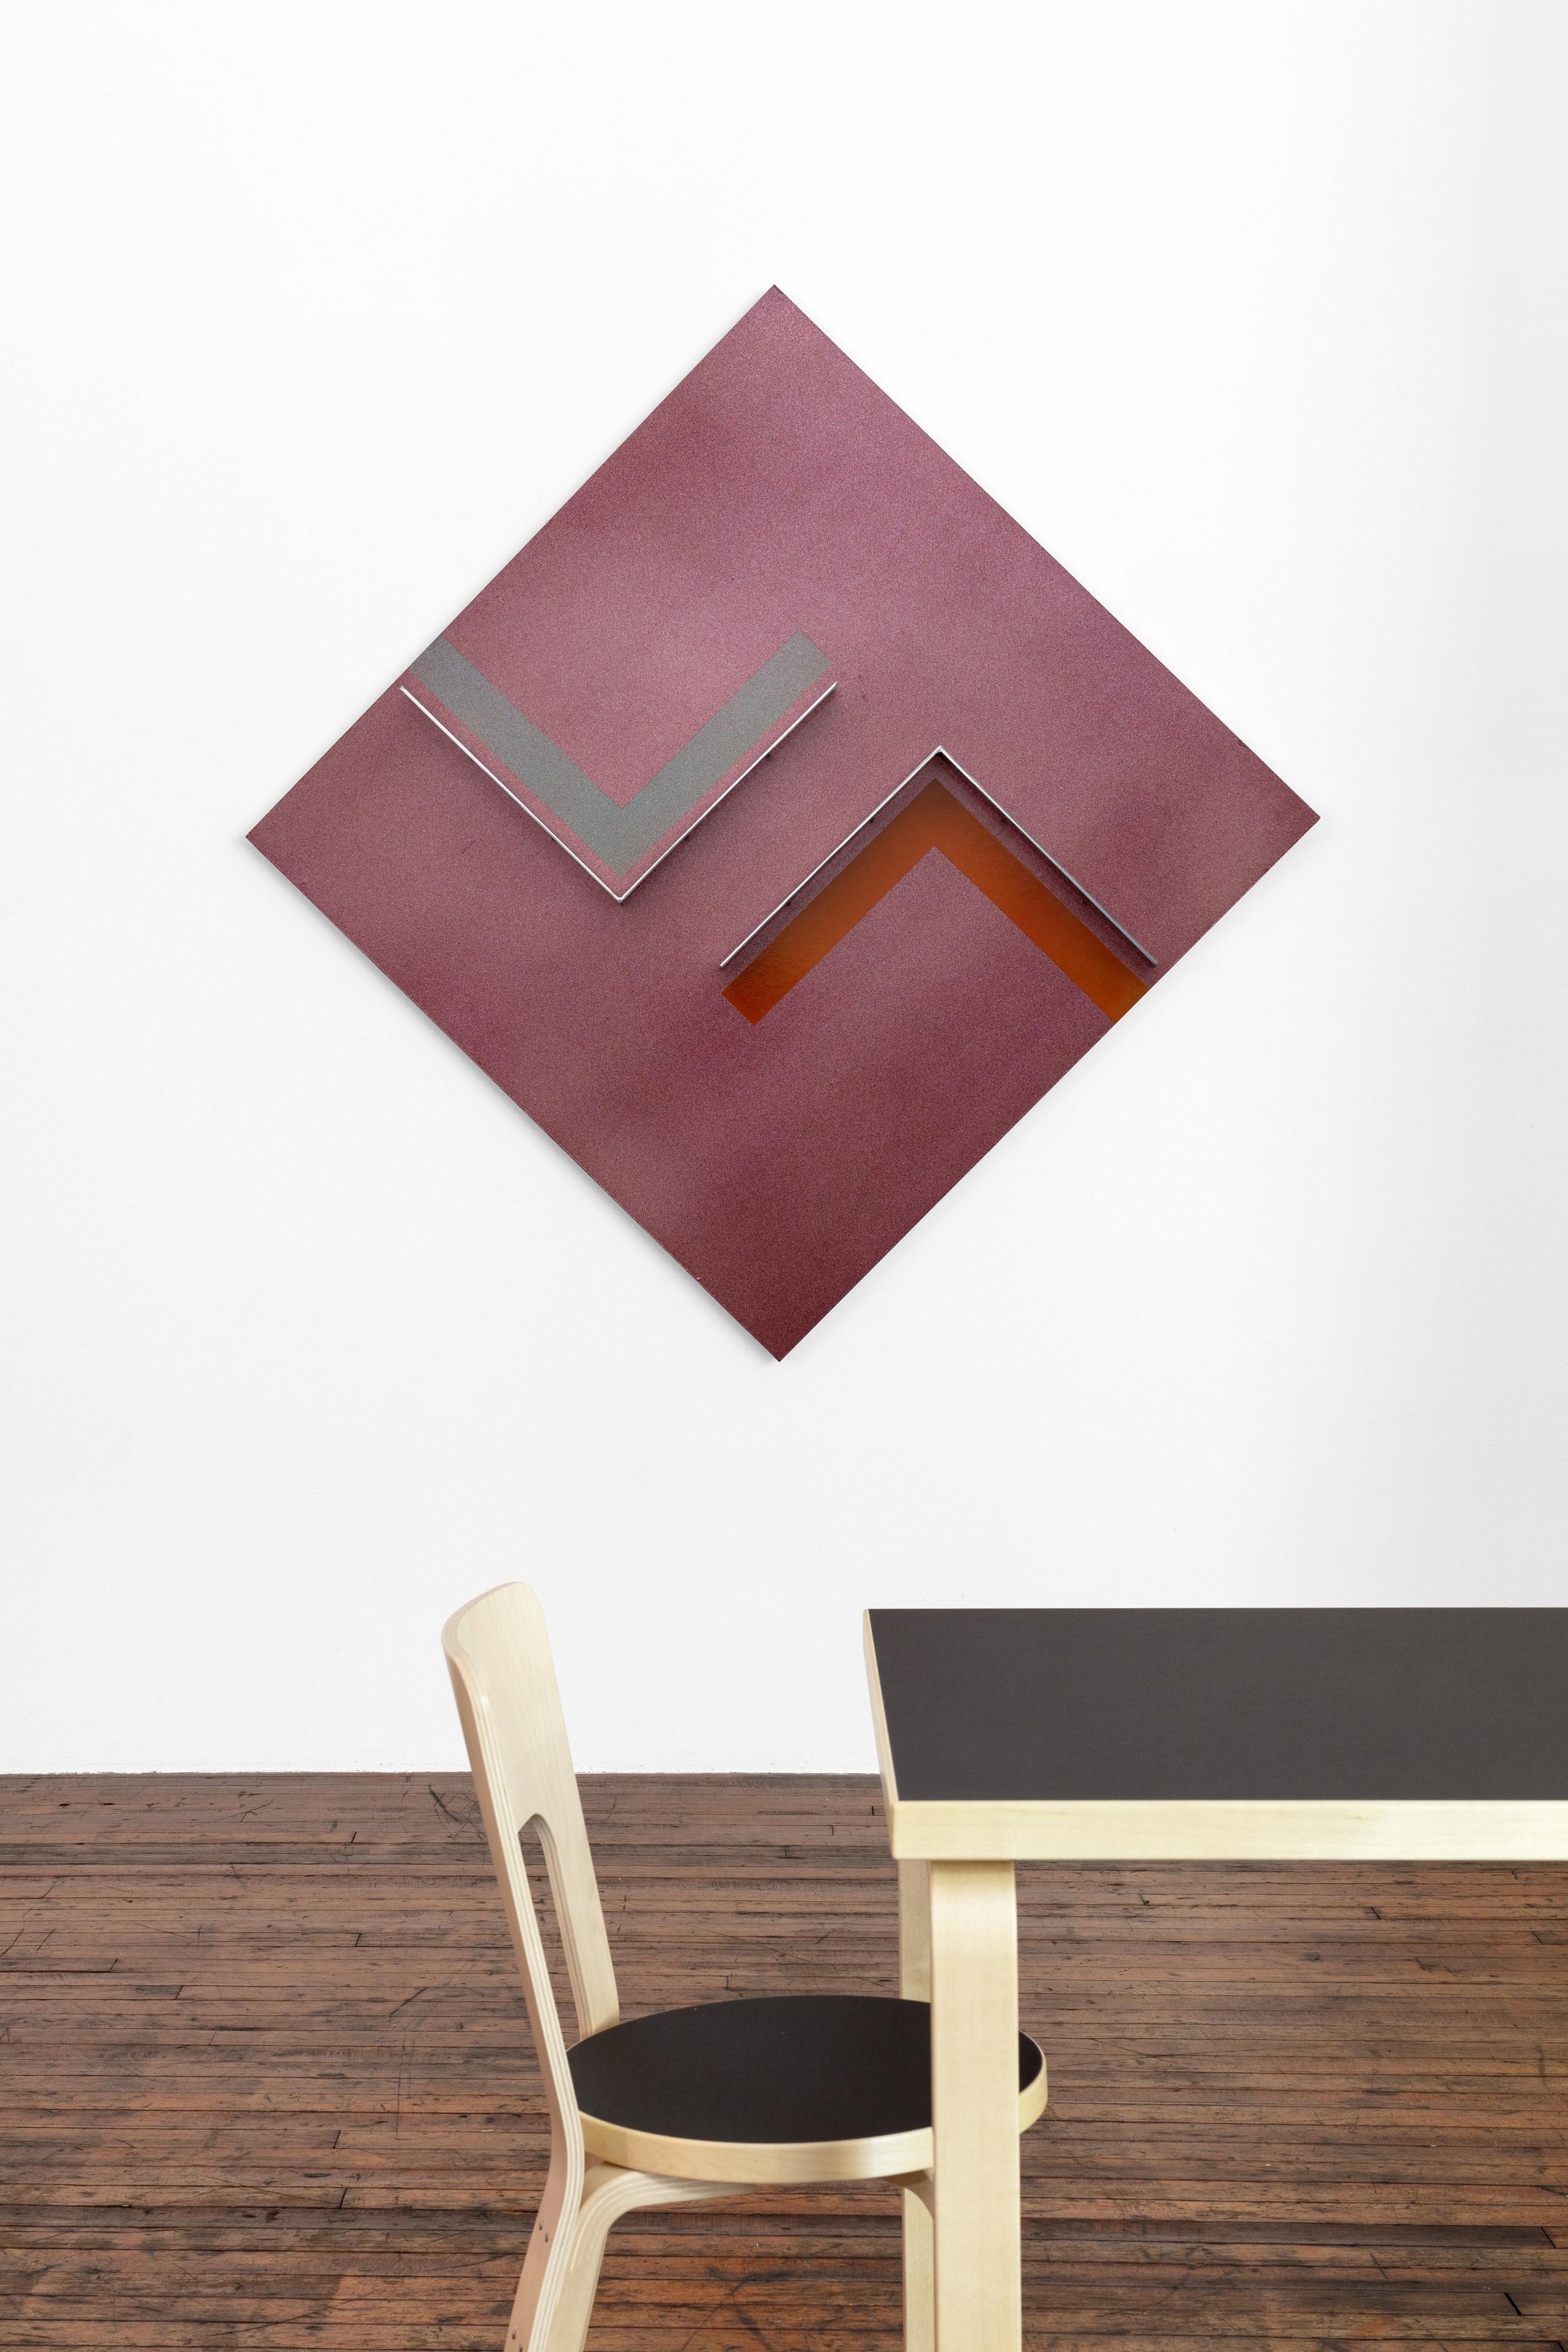 Aalto + Chamberlain at the Judd Foundation